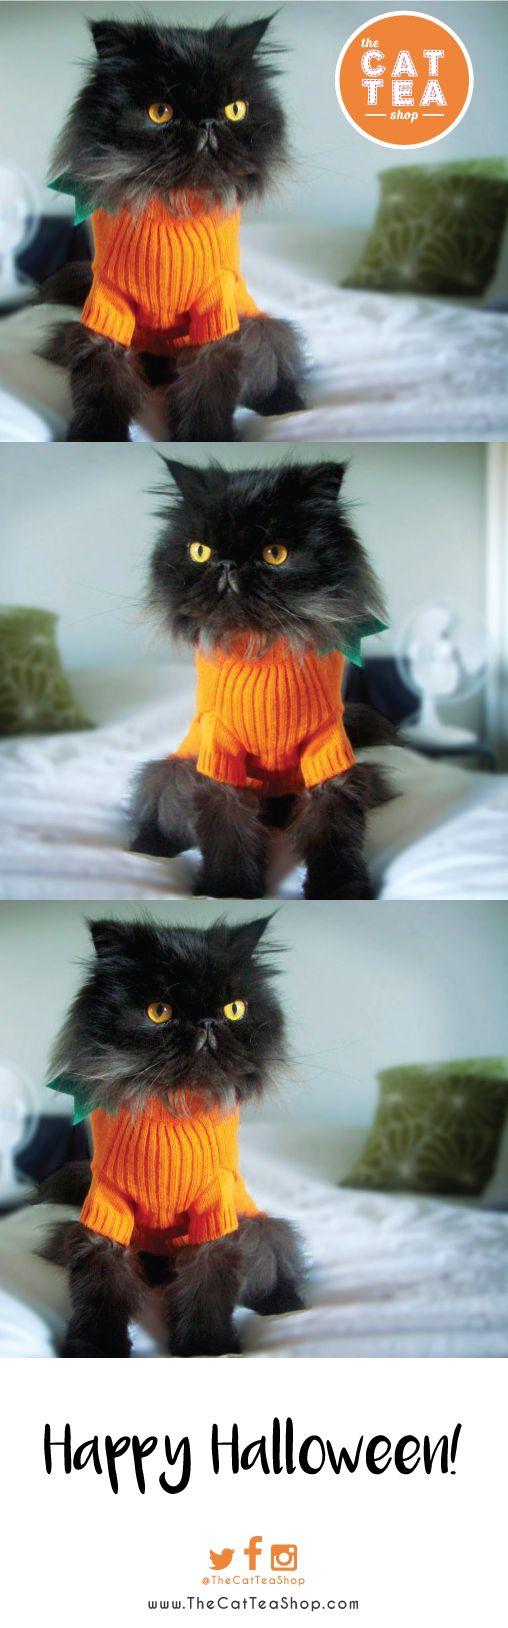 Pumpkin Kitty !  #Halloween #jackskeleton #pumpkin #pumpkincookies #pumpkins #pumpkin #cat #cats #catnip #organic #toronto #canada #ontario #thecatteashop #ghostcookies #candycorn #trickortreat